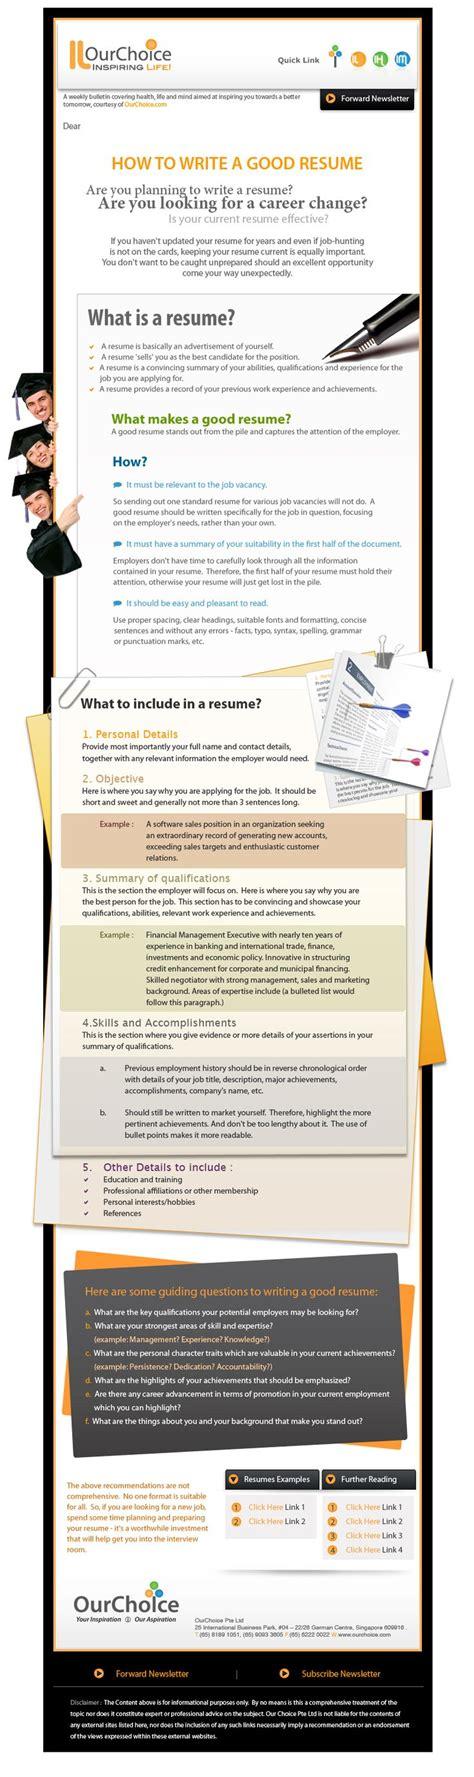 25 unique good resume examples ideas on pinterest good resume